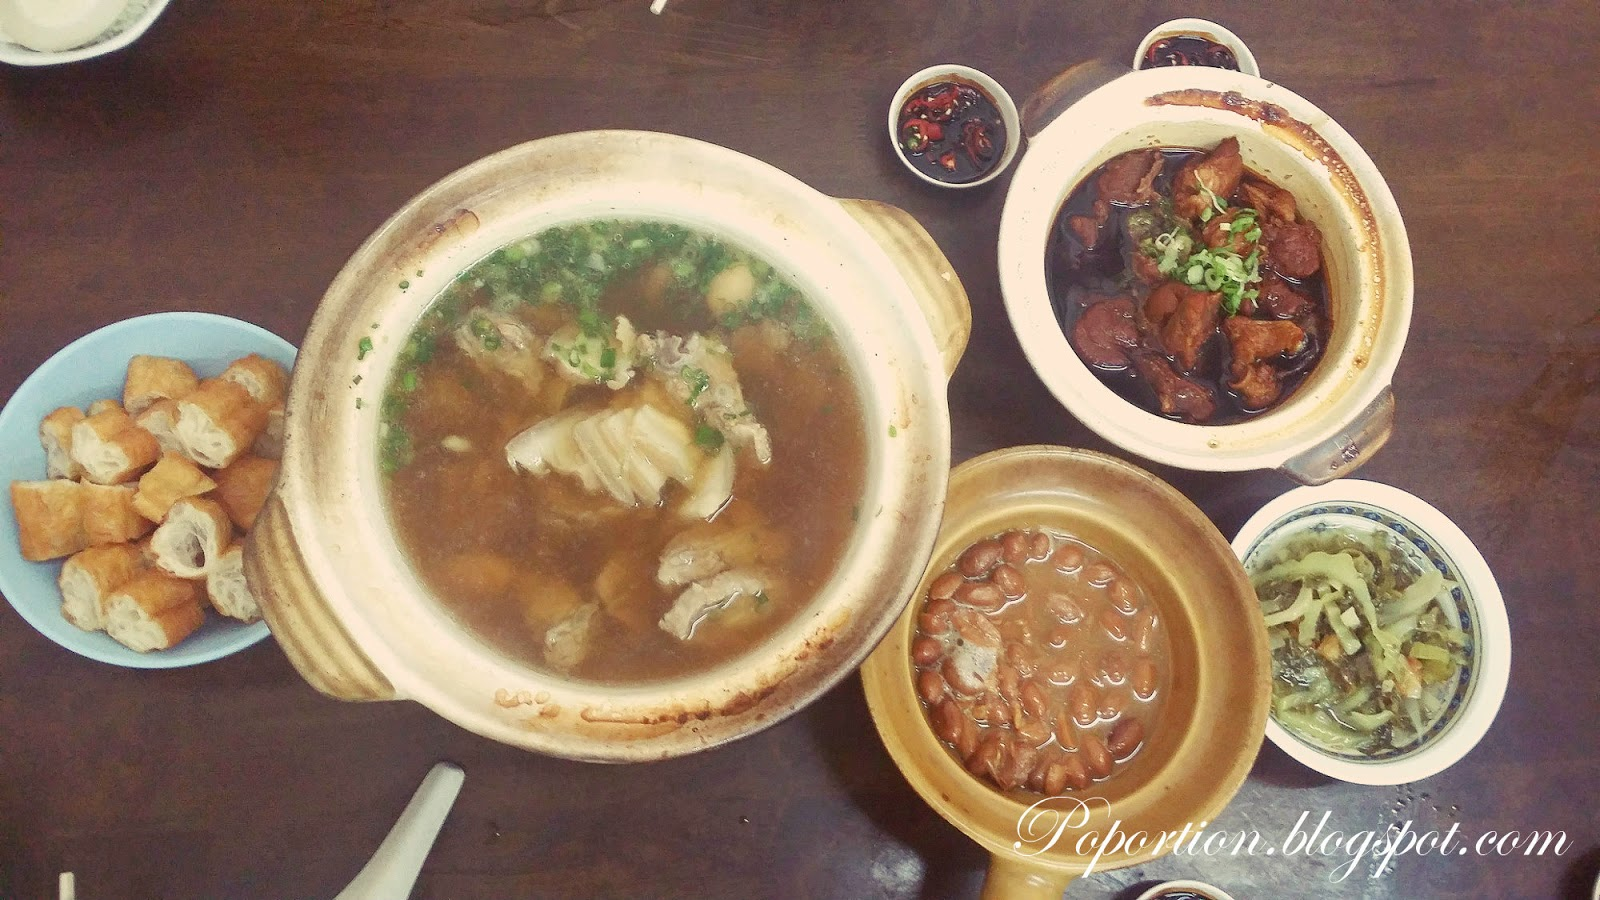 ksl mall famous food